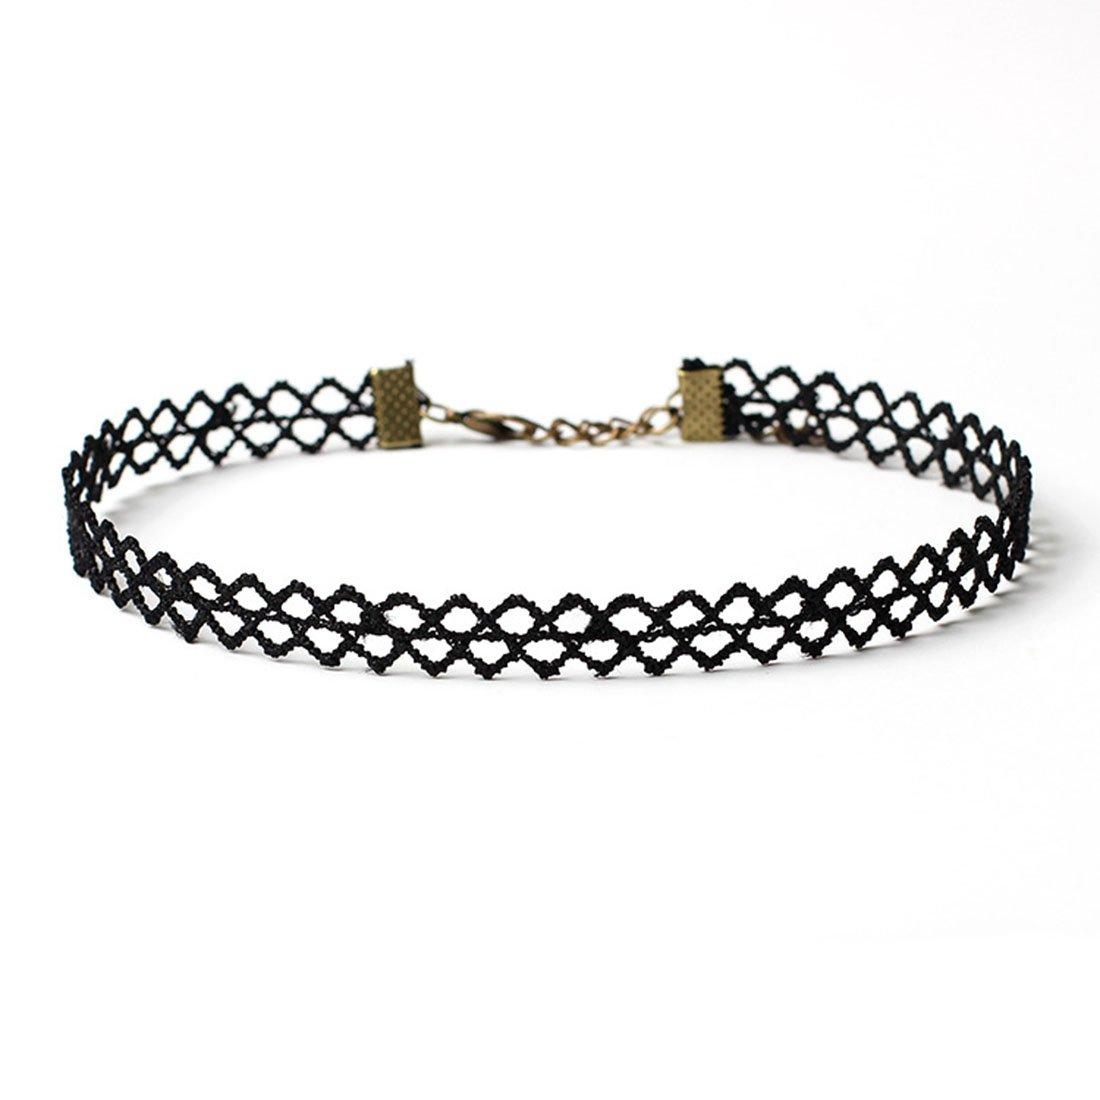 Macsen Womens Girls Choker Collar Necklace Gothic Simple Accessories Ornaments Poirot False Collar Jewelry Set 10 PCS